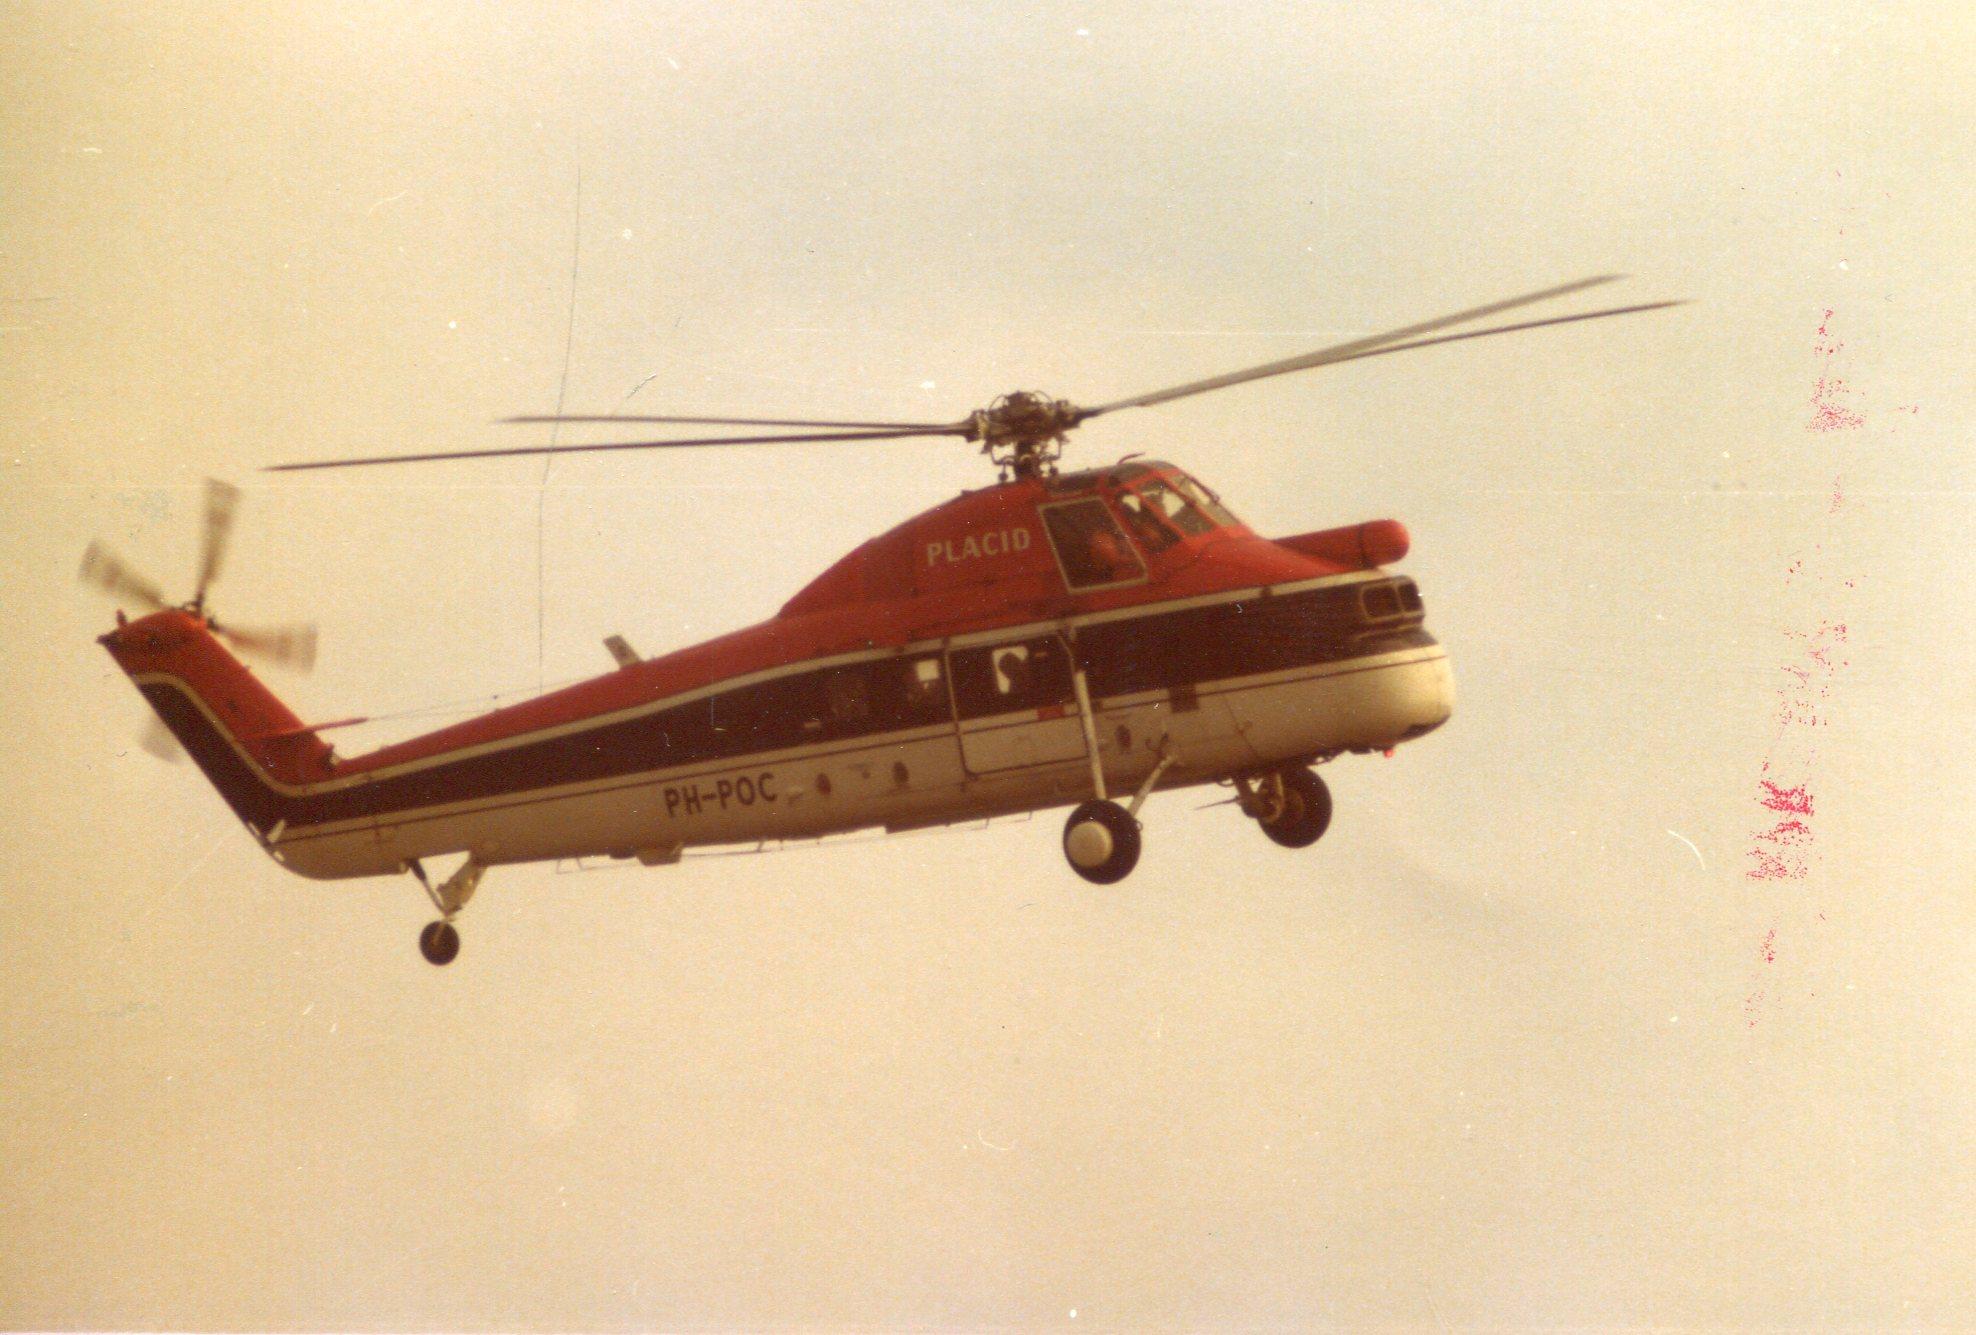 Naam: Den Helder , april 1977 (3).jpg Bekeken: 204 Grootte: 334,4 KB